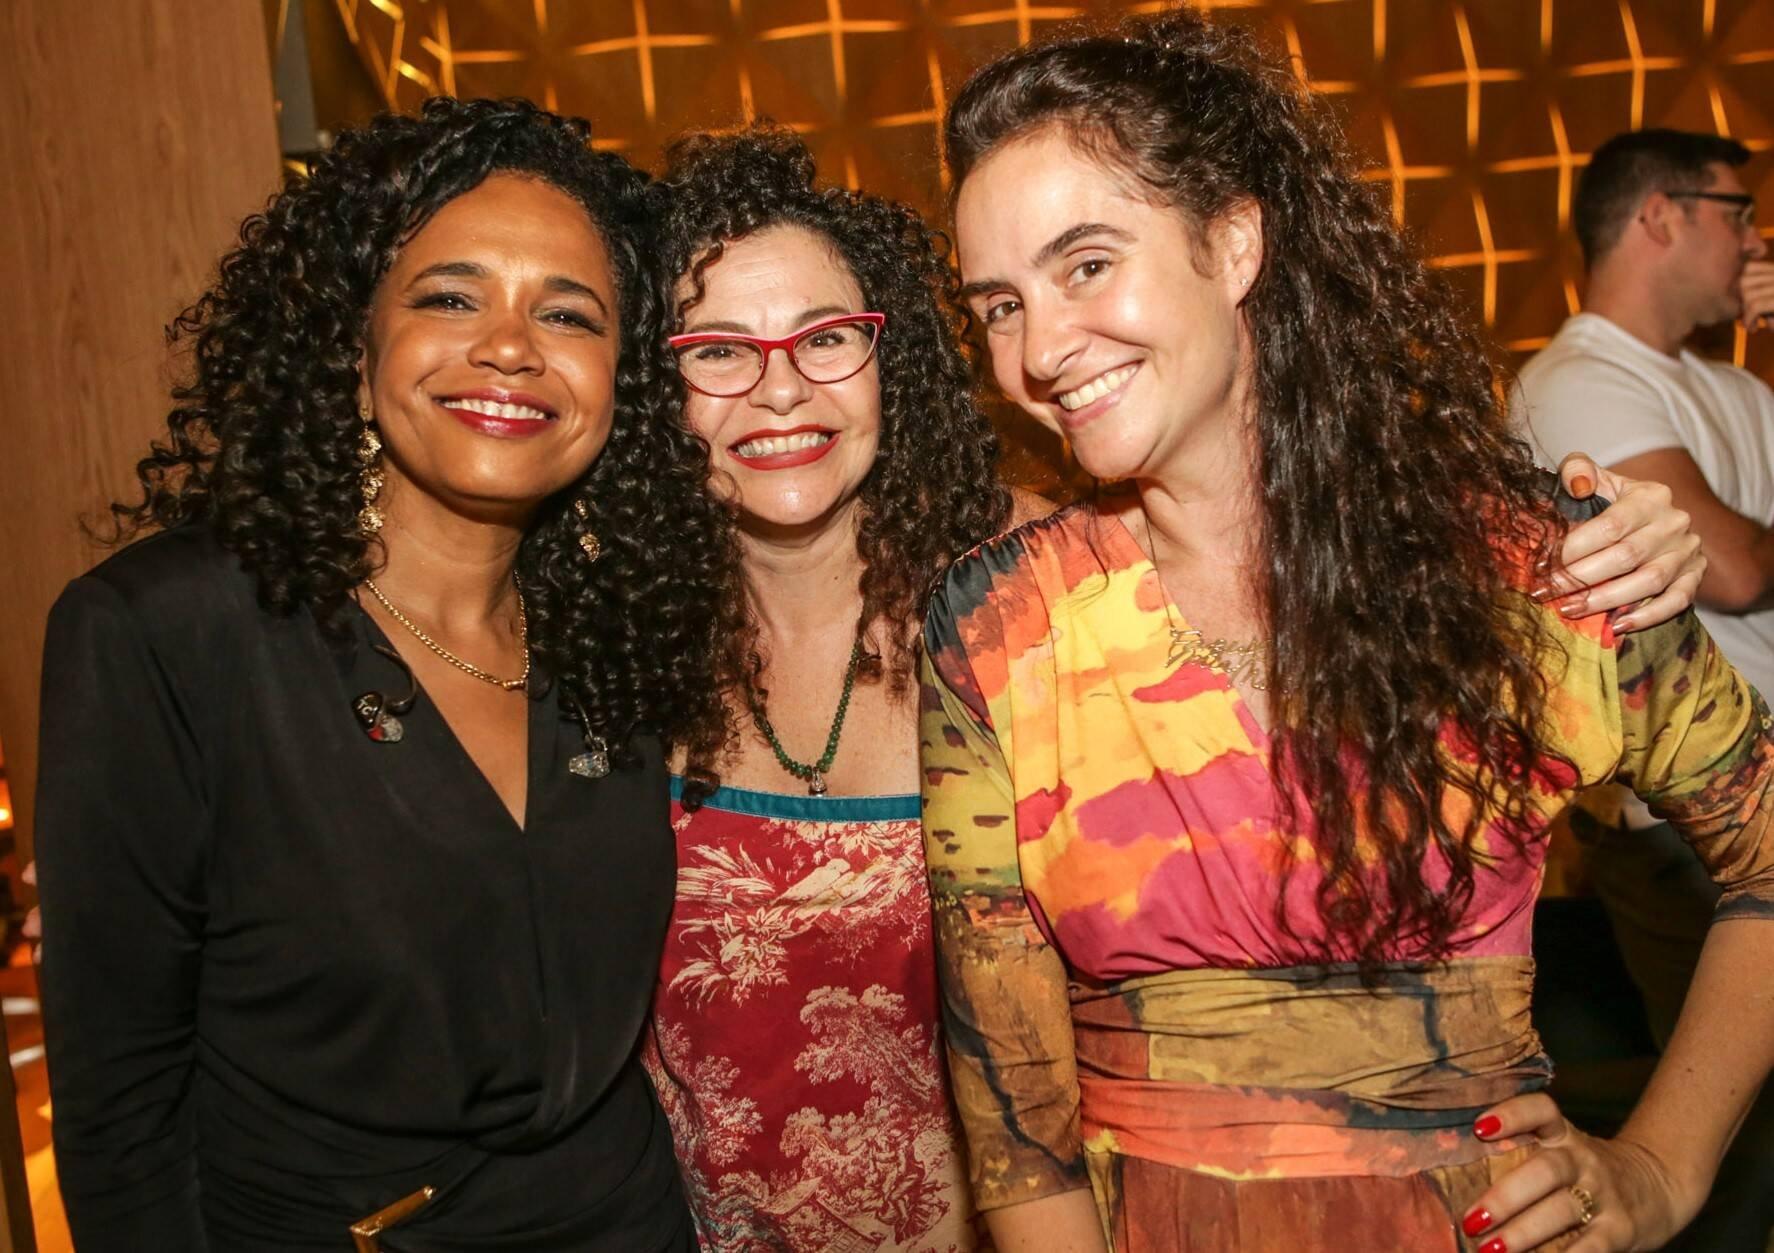 Teresa Cristina, Yara Figueiredo e Alessa  /Foto: Gianne Carvalho